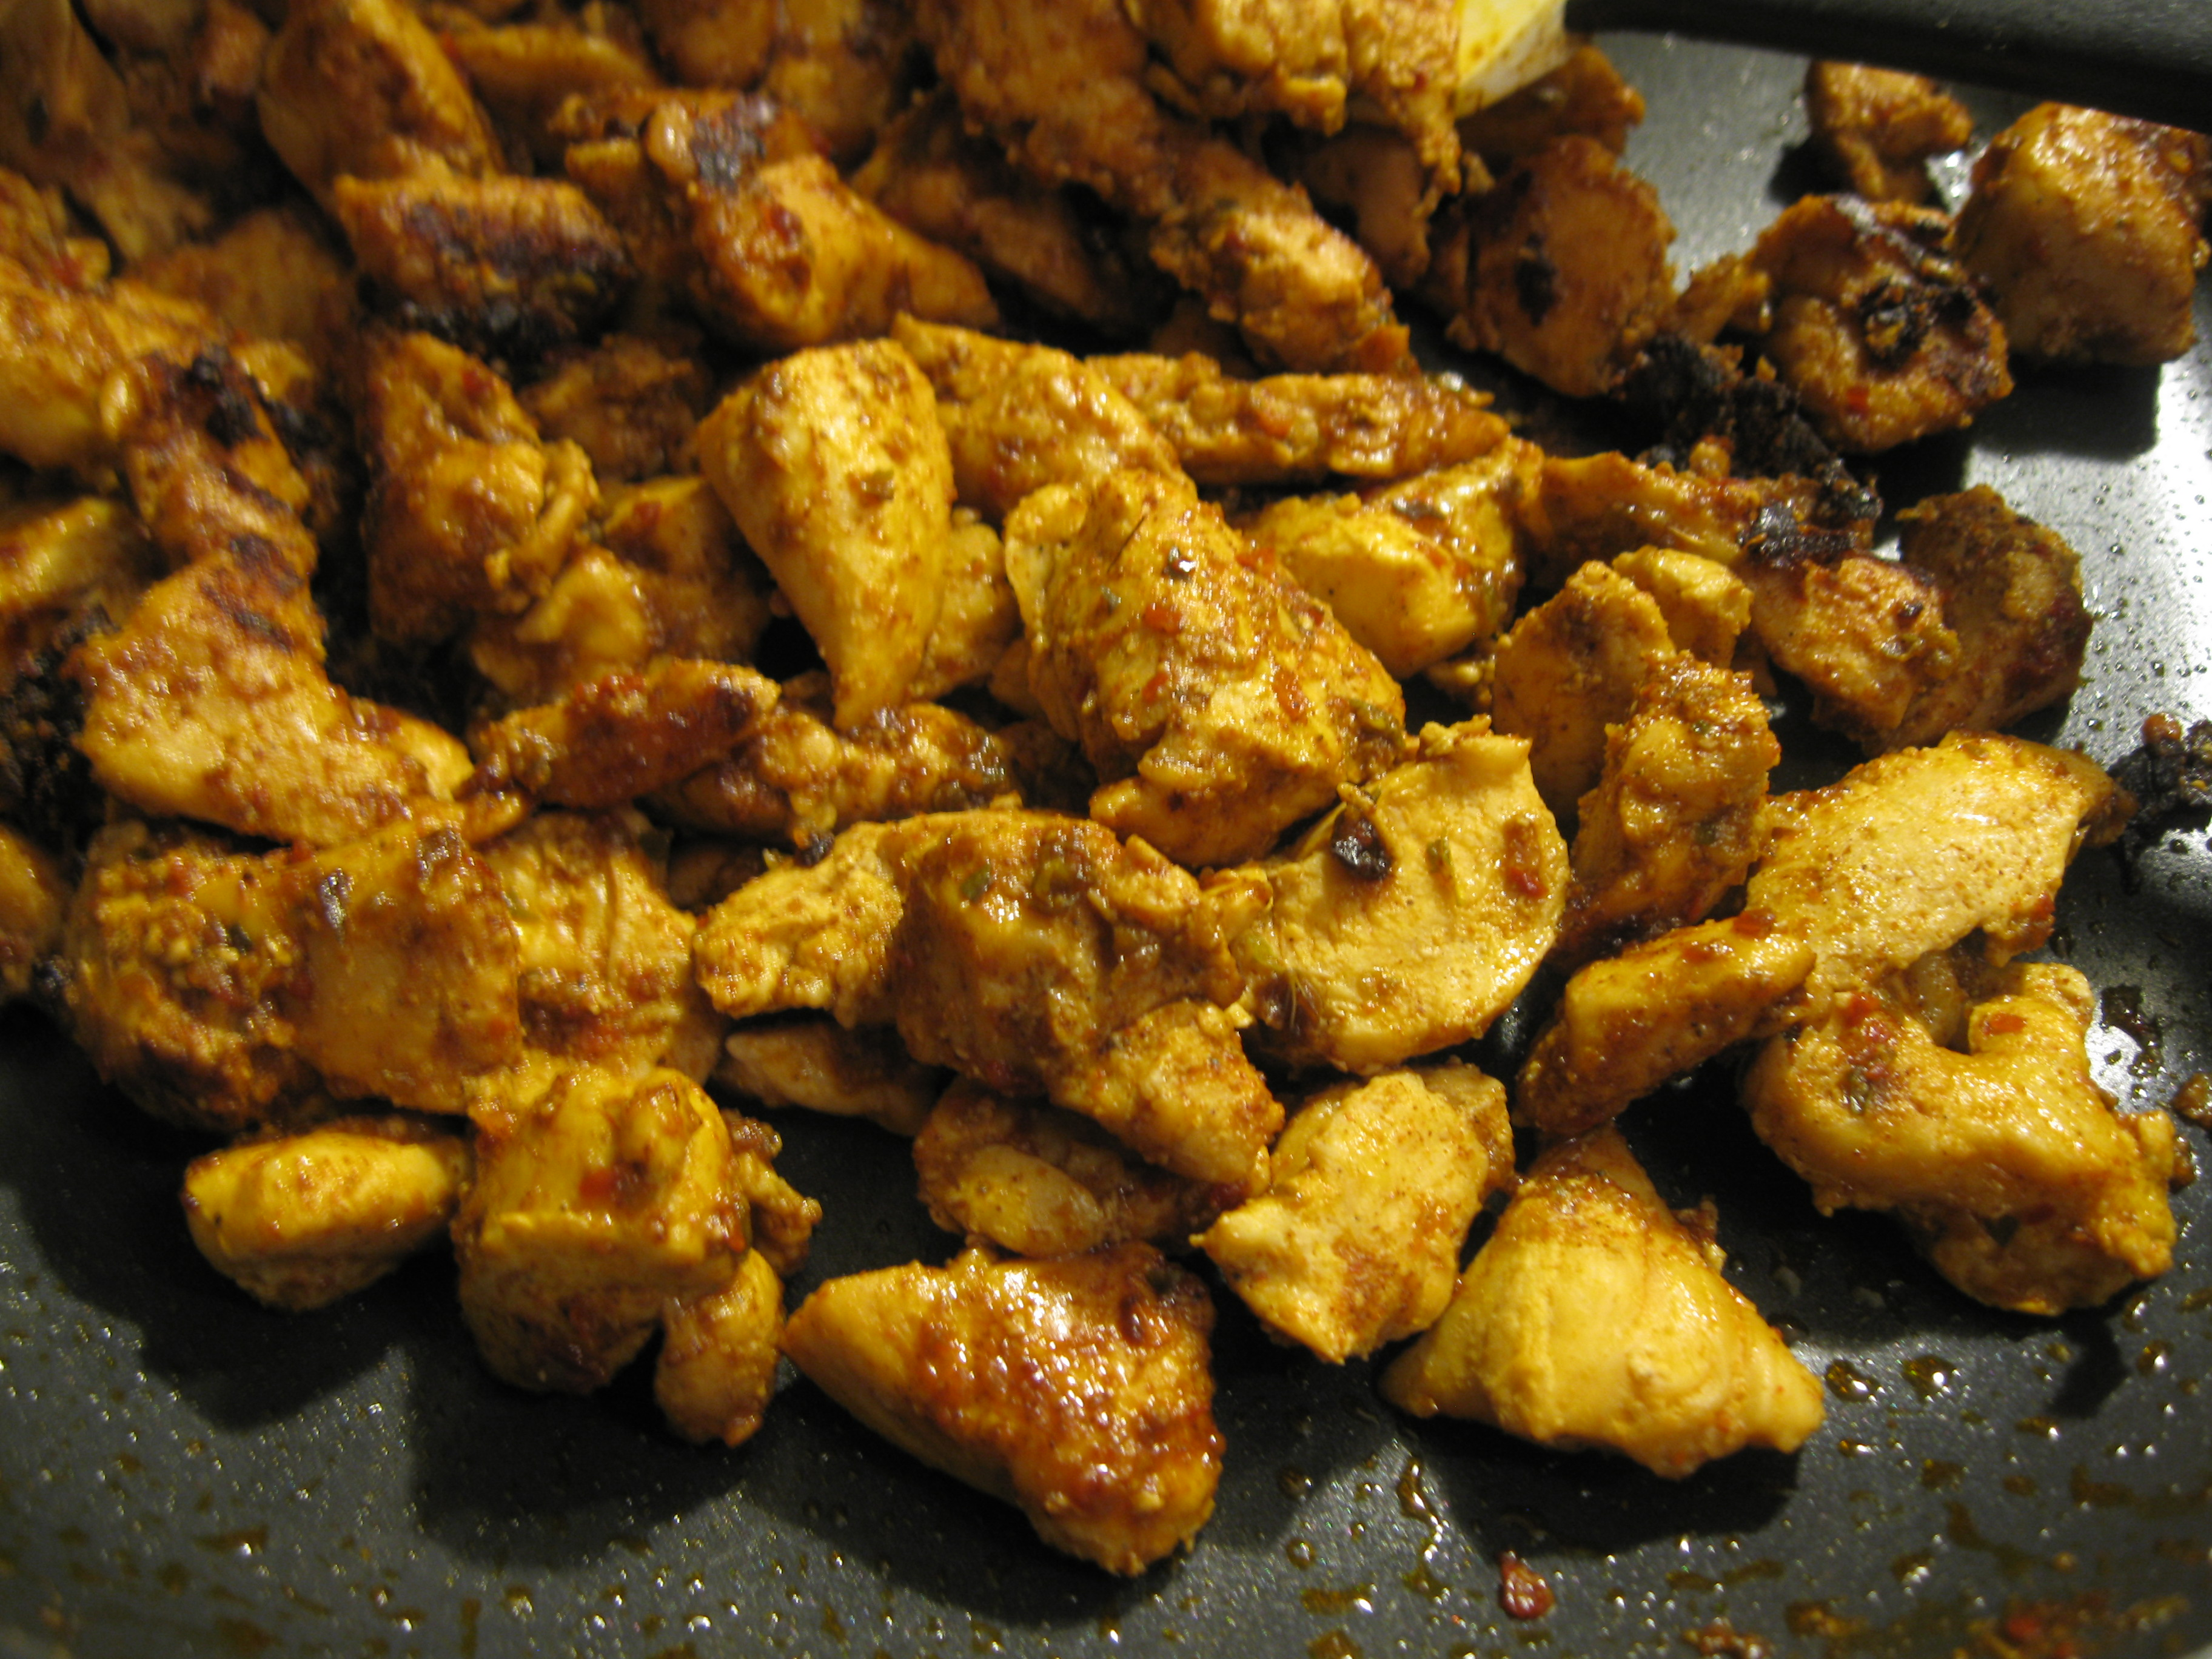 Recipe 15.2: Chicken Quesadillas with Homemade Pico de Gallo